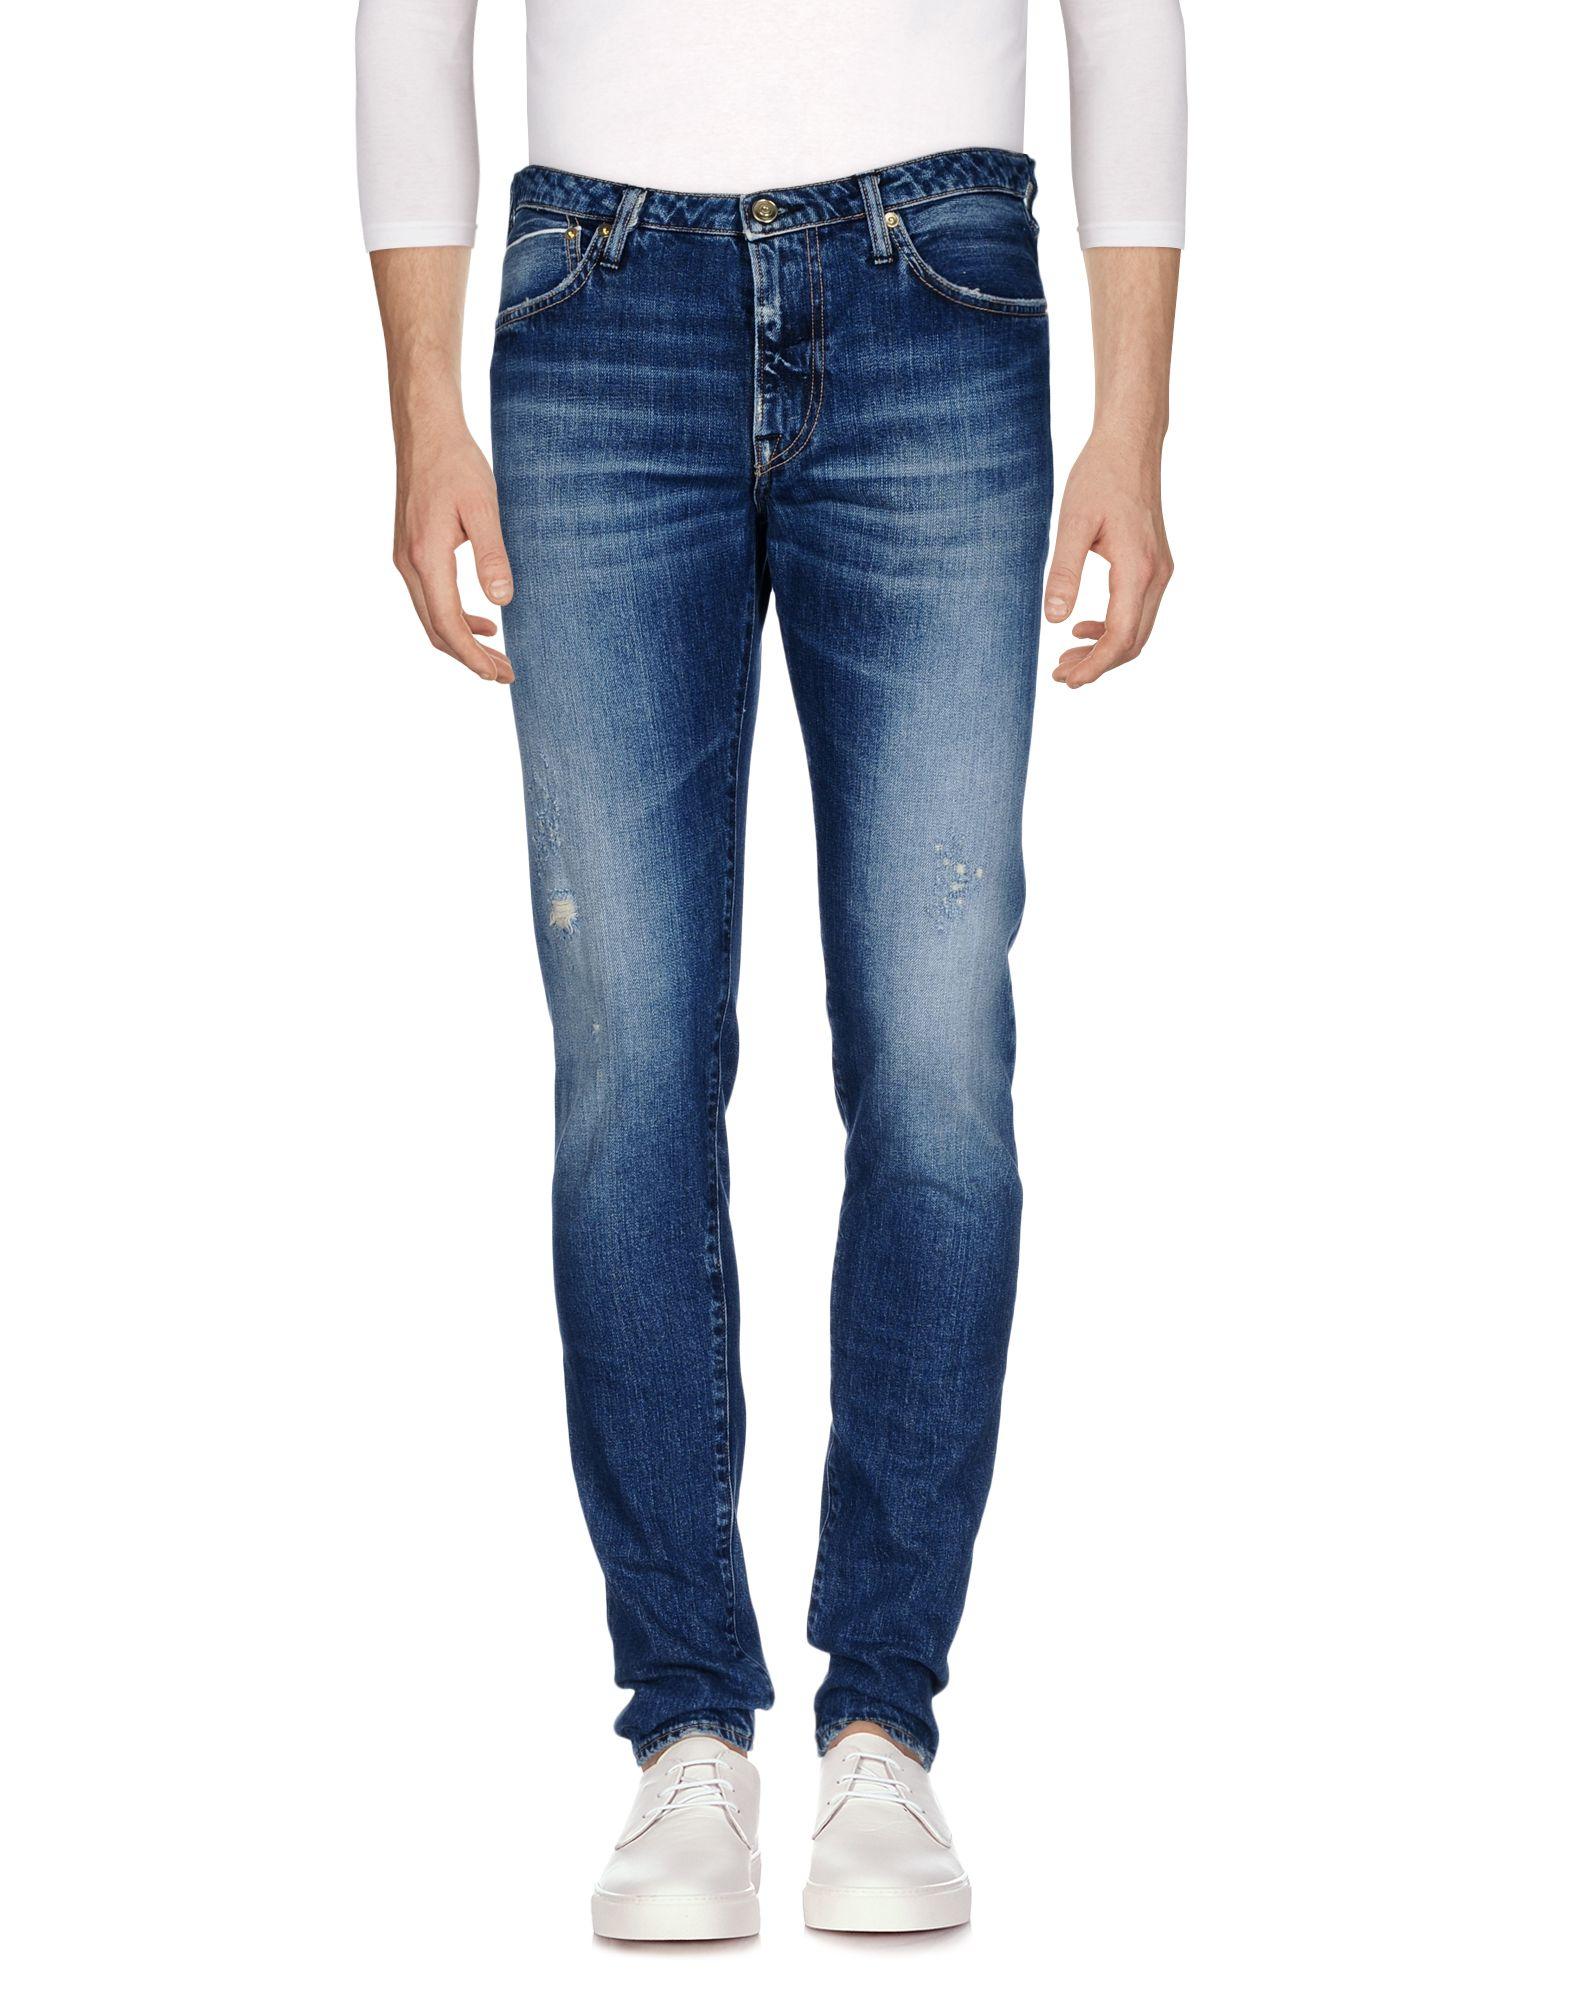 Acquista People Donna online Jeans su Lab Pantaloni ZzF6pqw